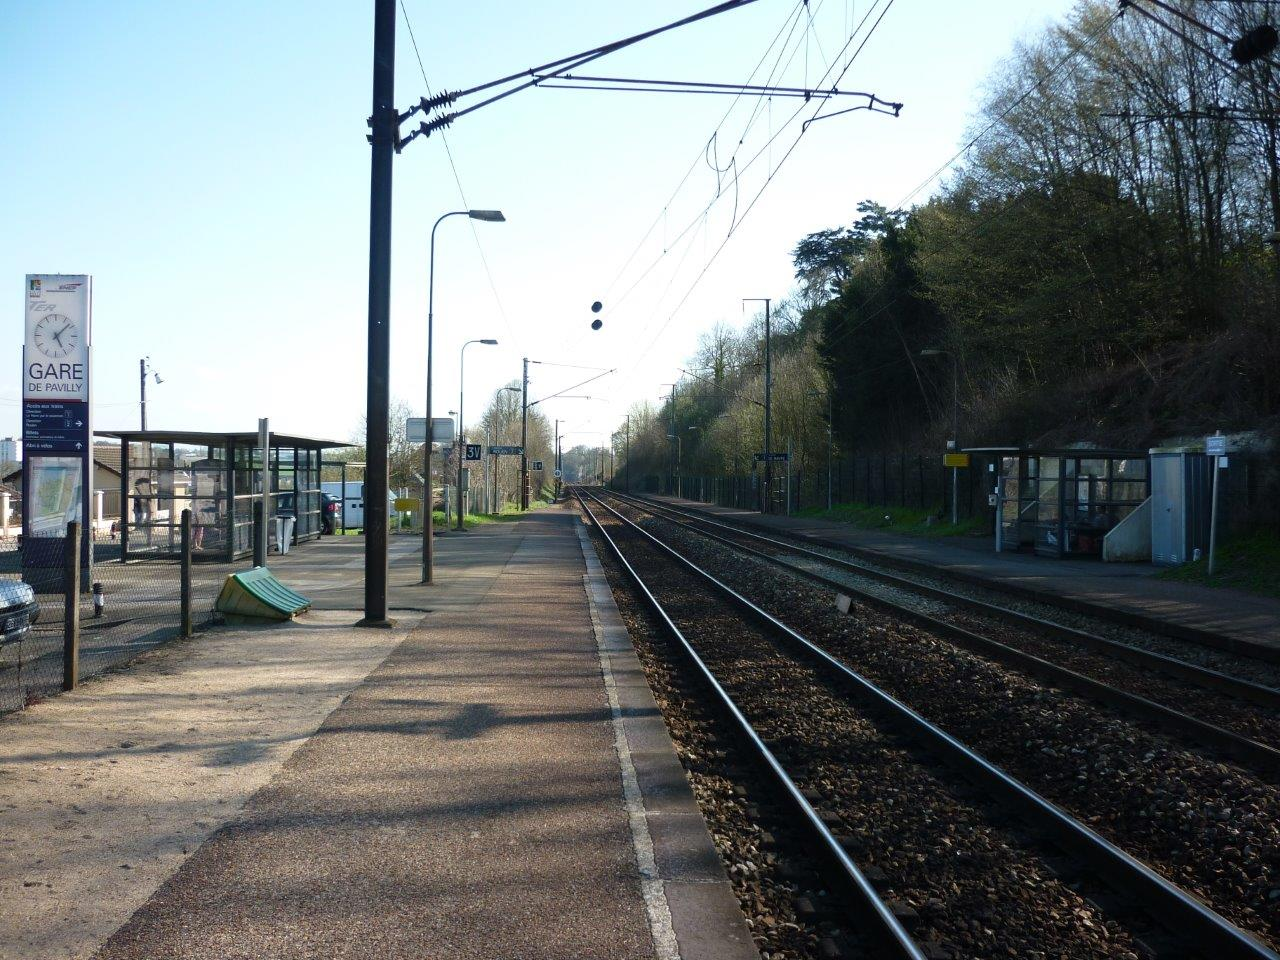 gare-de-pavilly-station-train-station